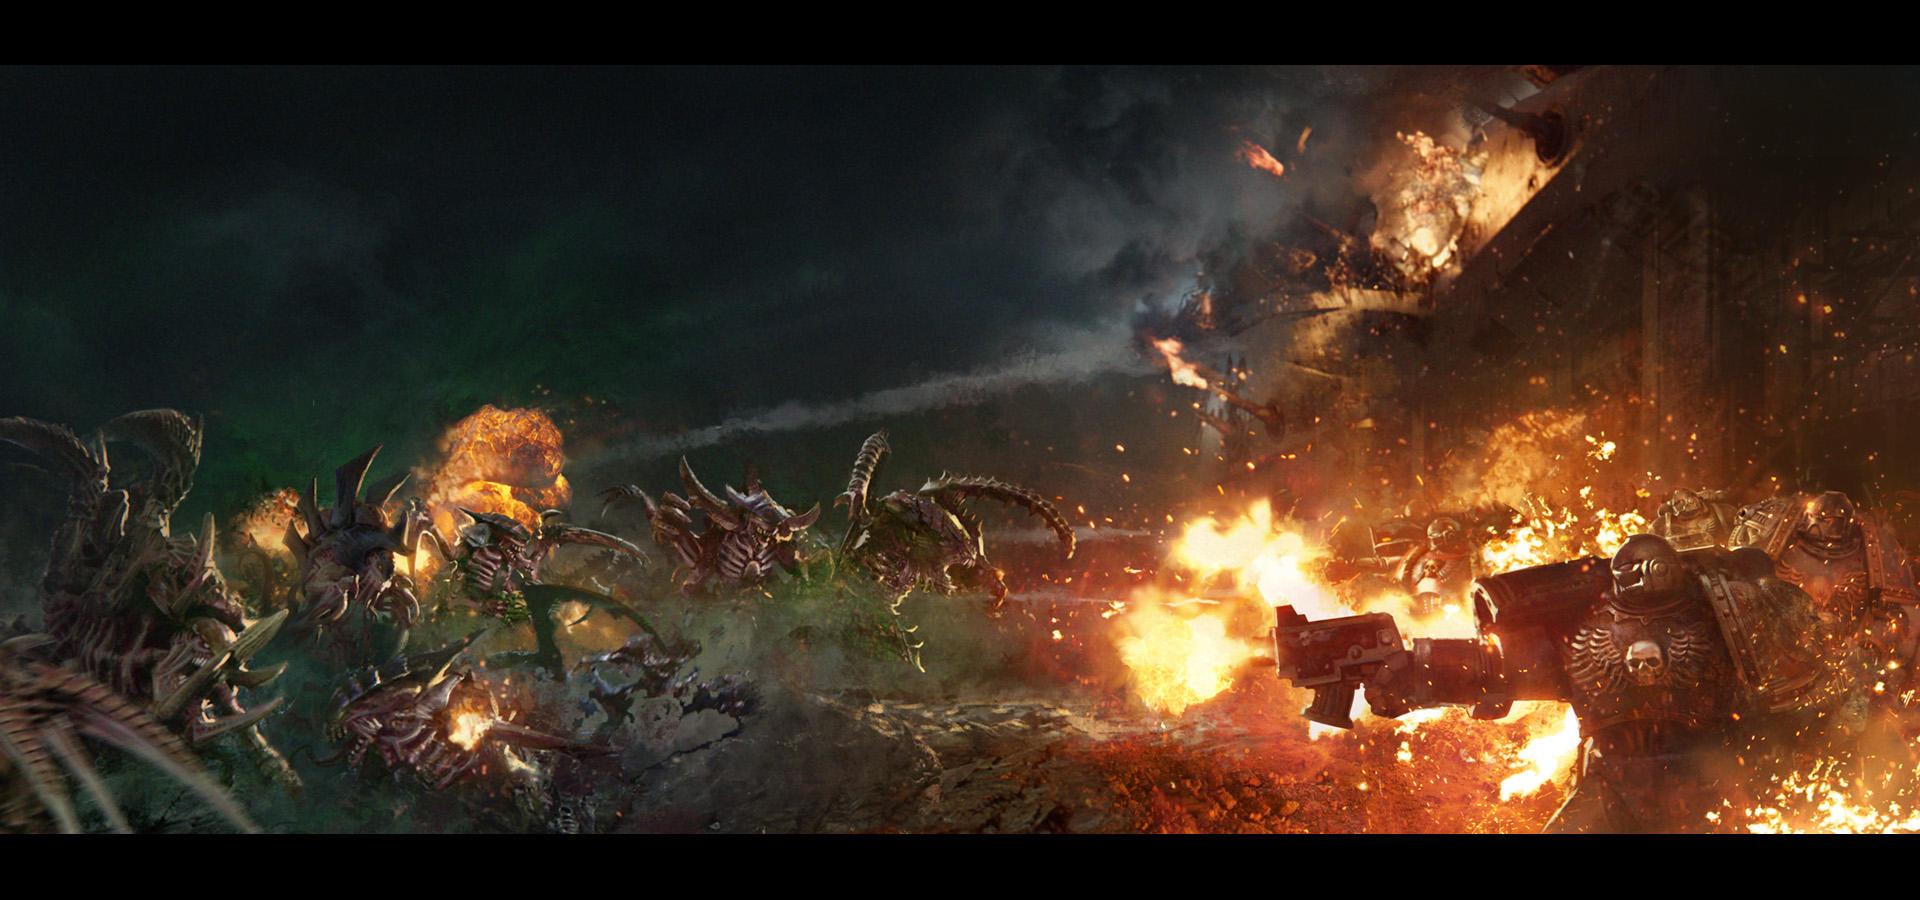 Shield of Baal: Tyranids vs Flesh Tearers by agnidevi